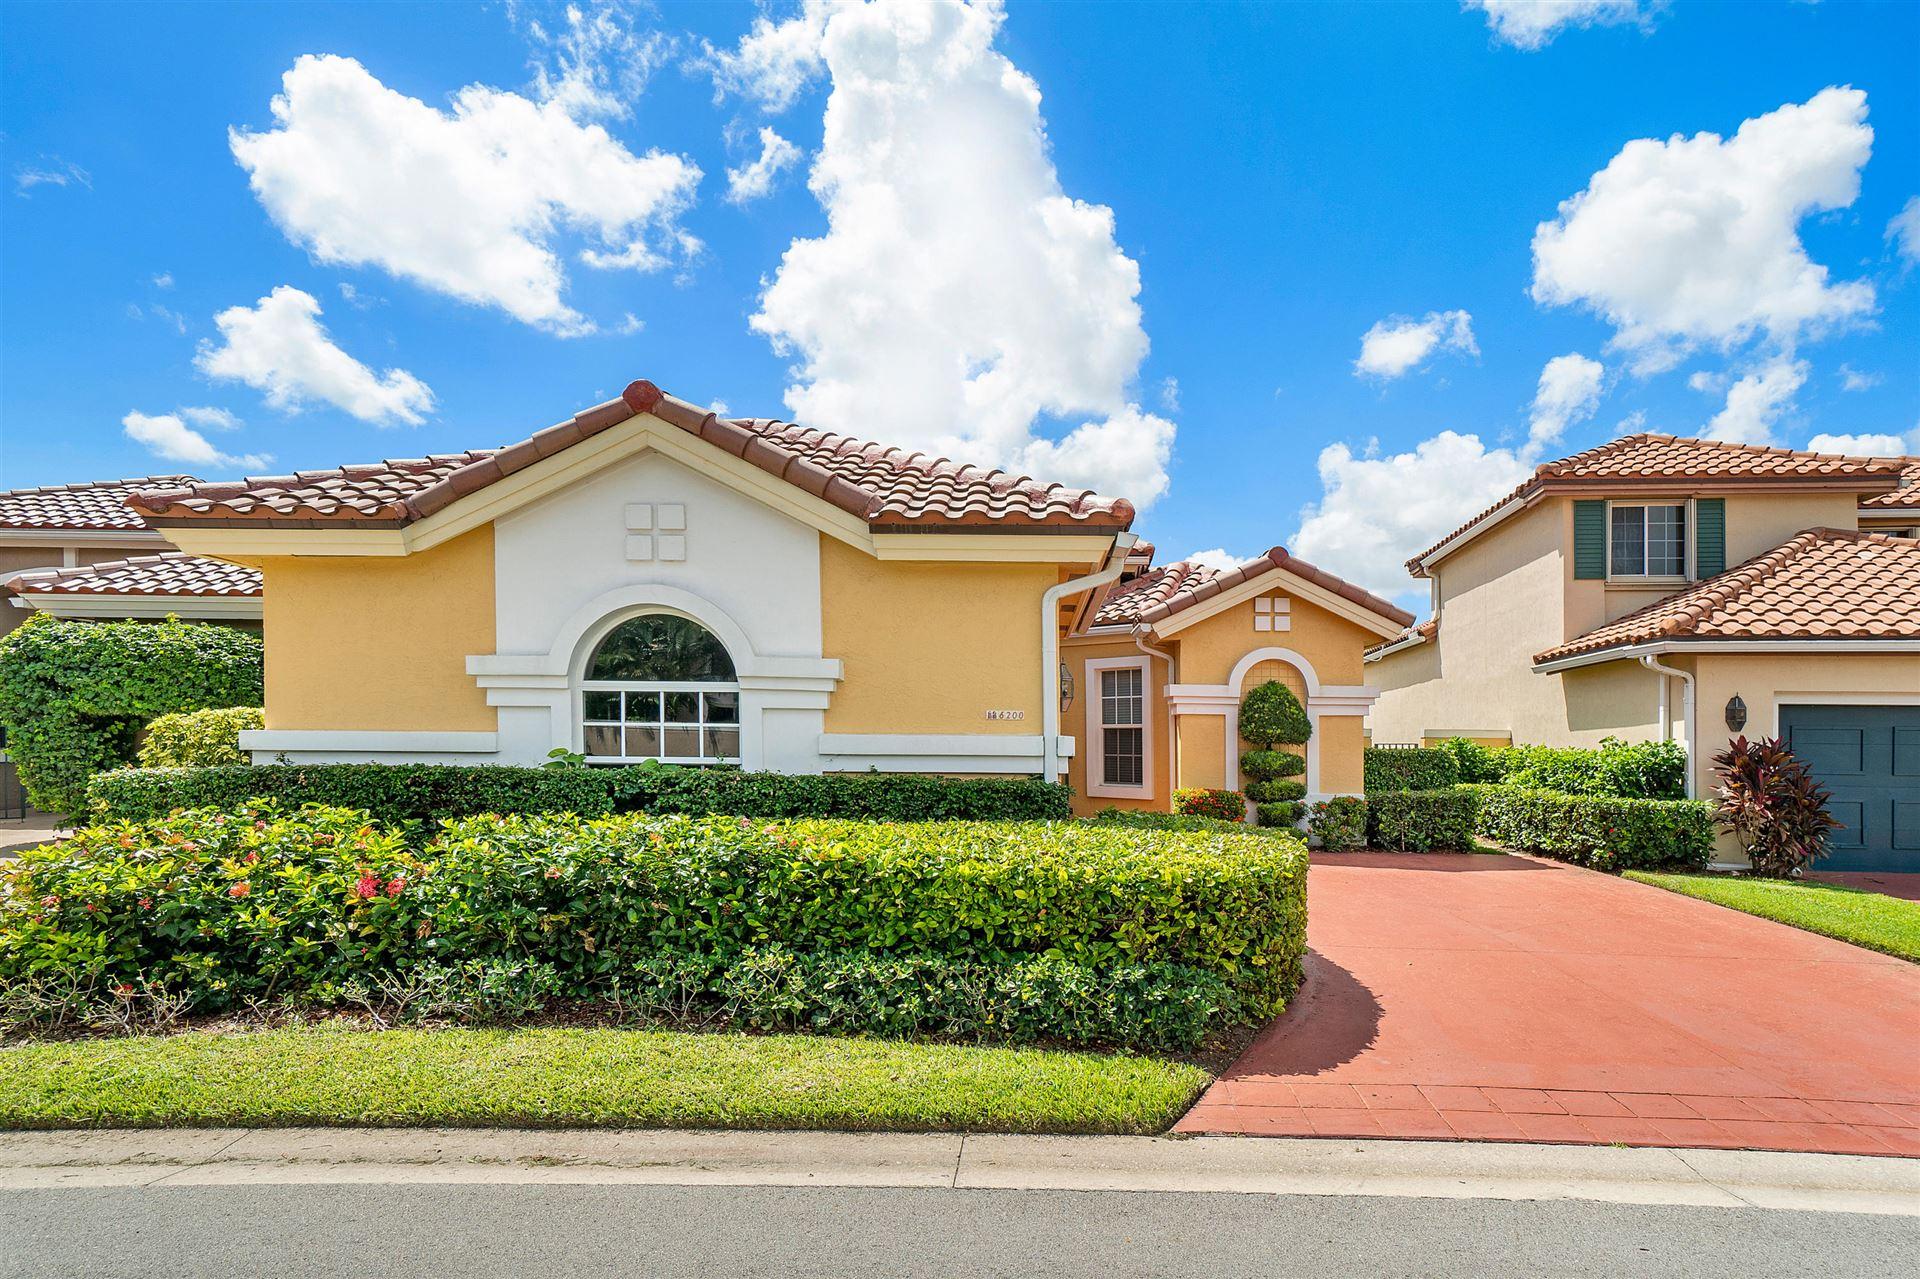 6200 NW 24th Street, Boca Raton, FL 33434 - #: RX-10598250